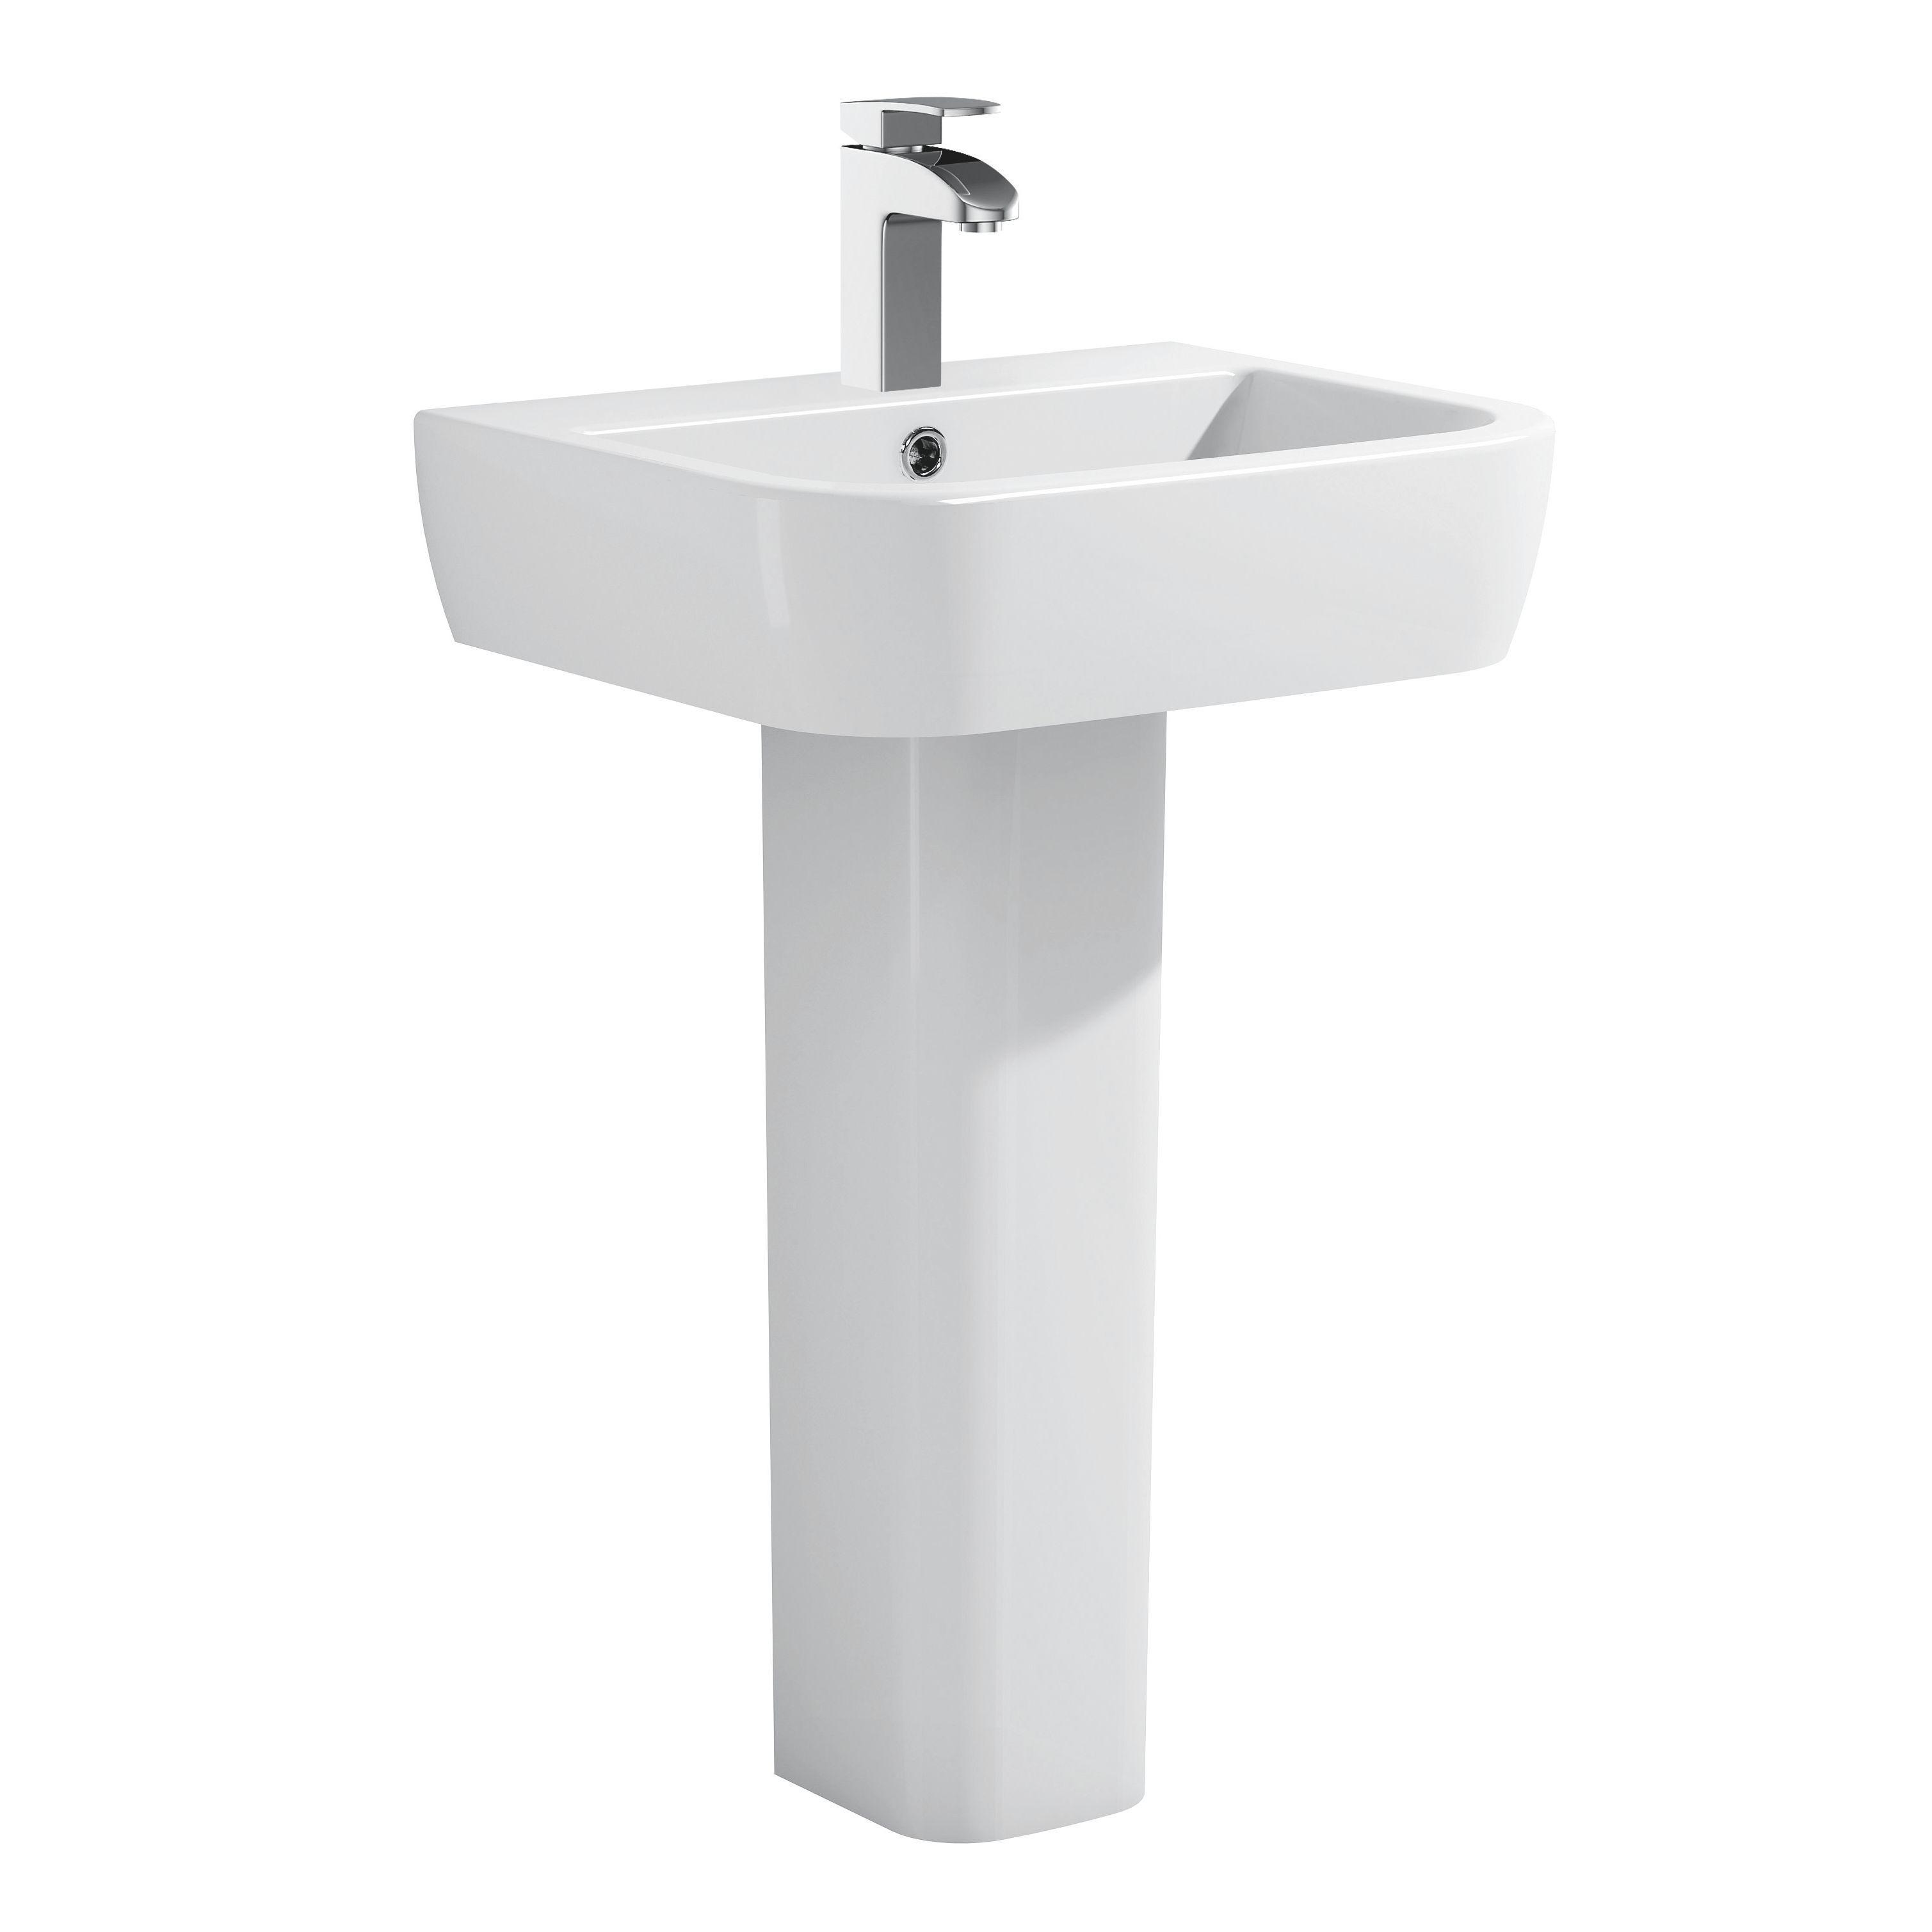 Glass Bathroom Sinks B&Q cooke & lewis affini square full pedestal basin | departments